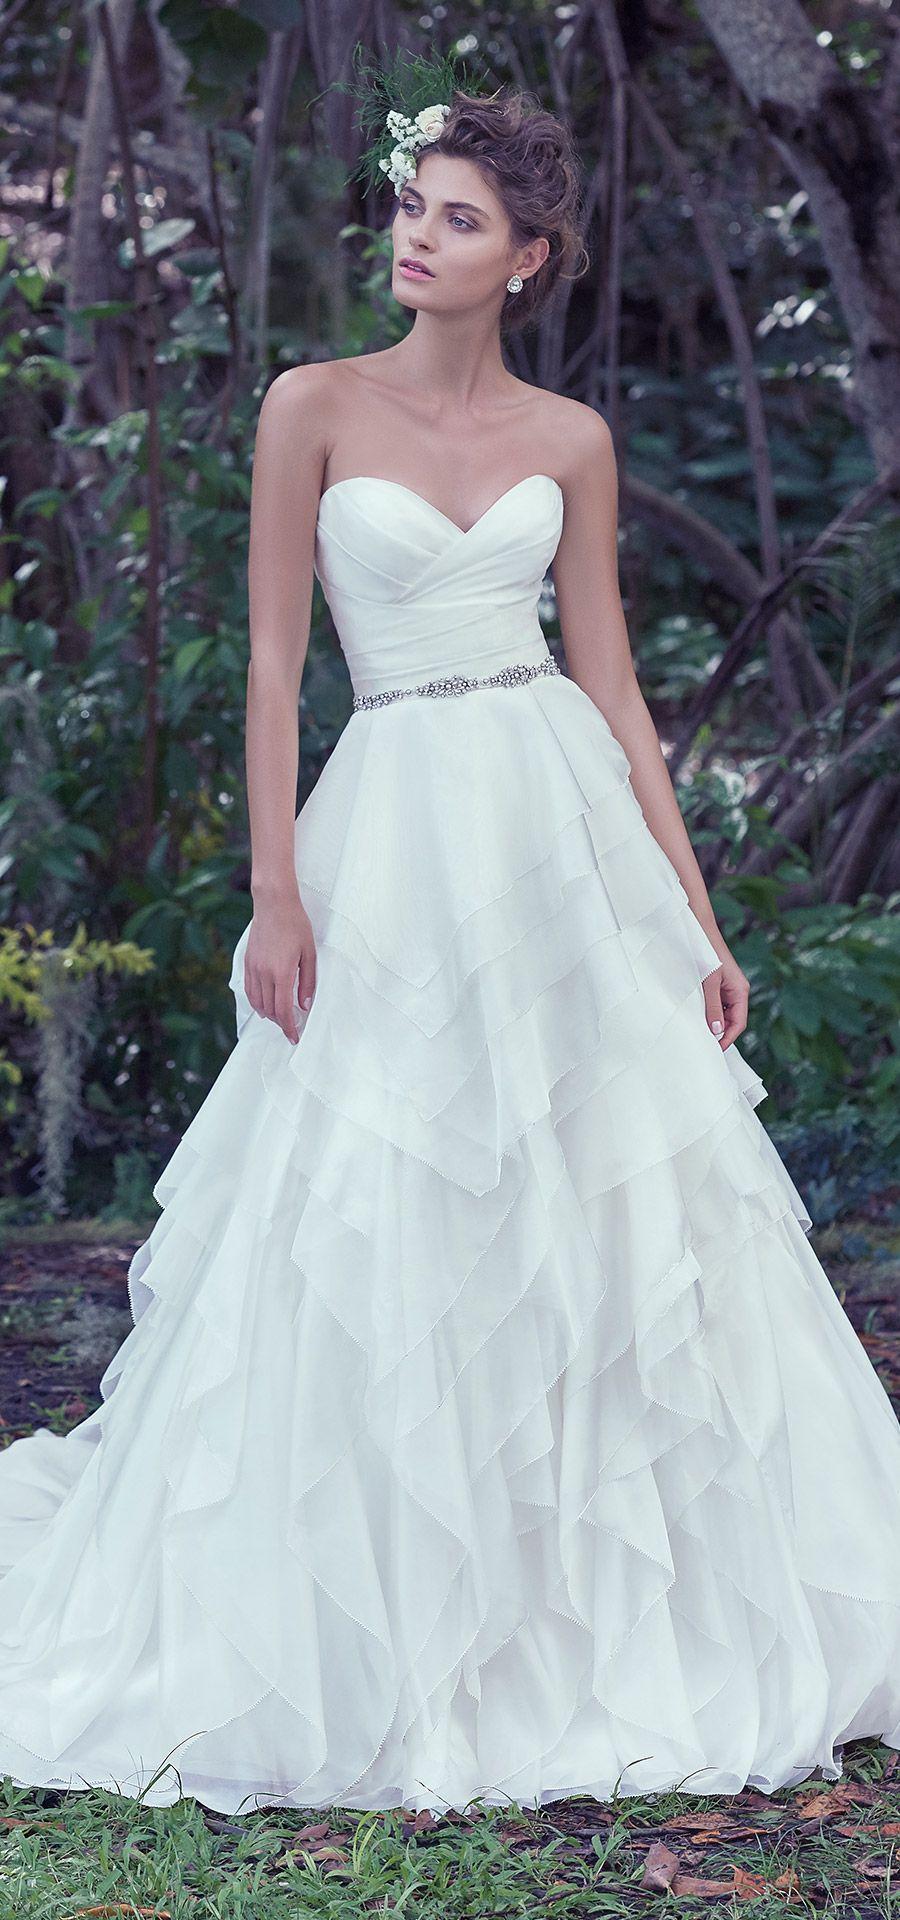 Maggie Sottero Wedding Dresses | Bodice, Wedding dress and Romantic